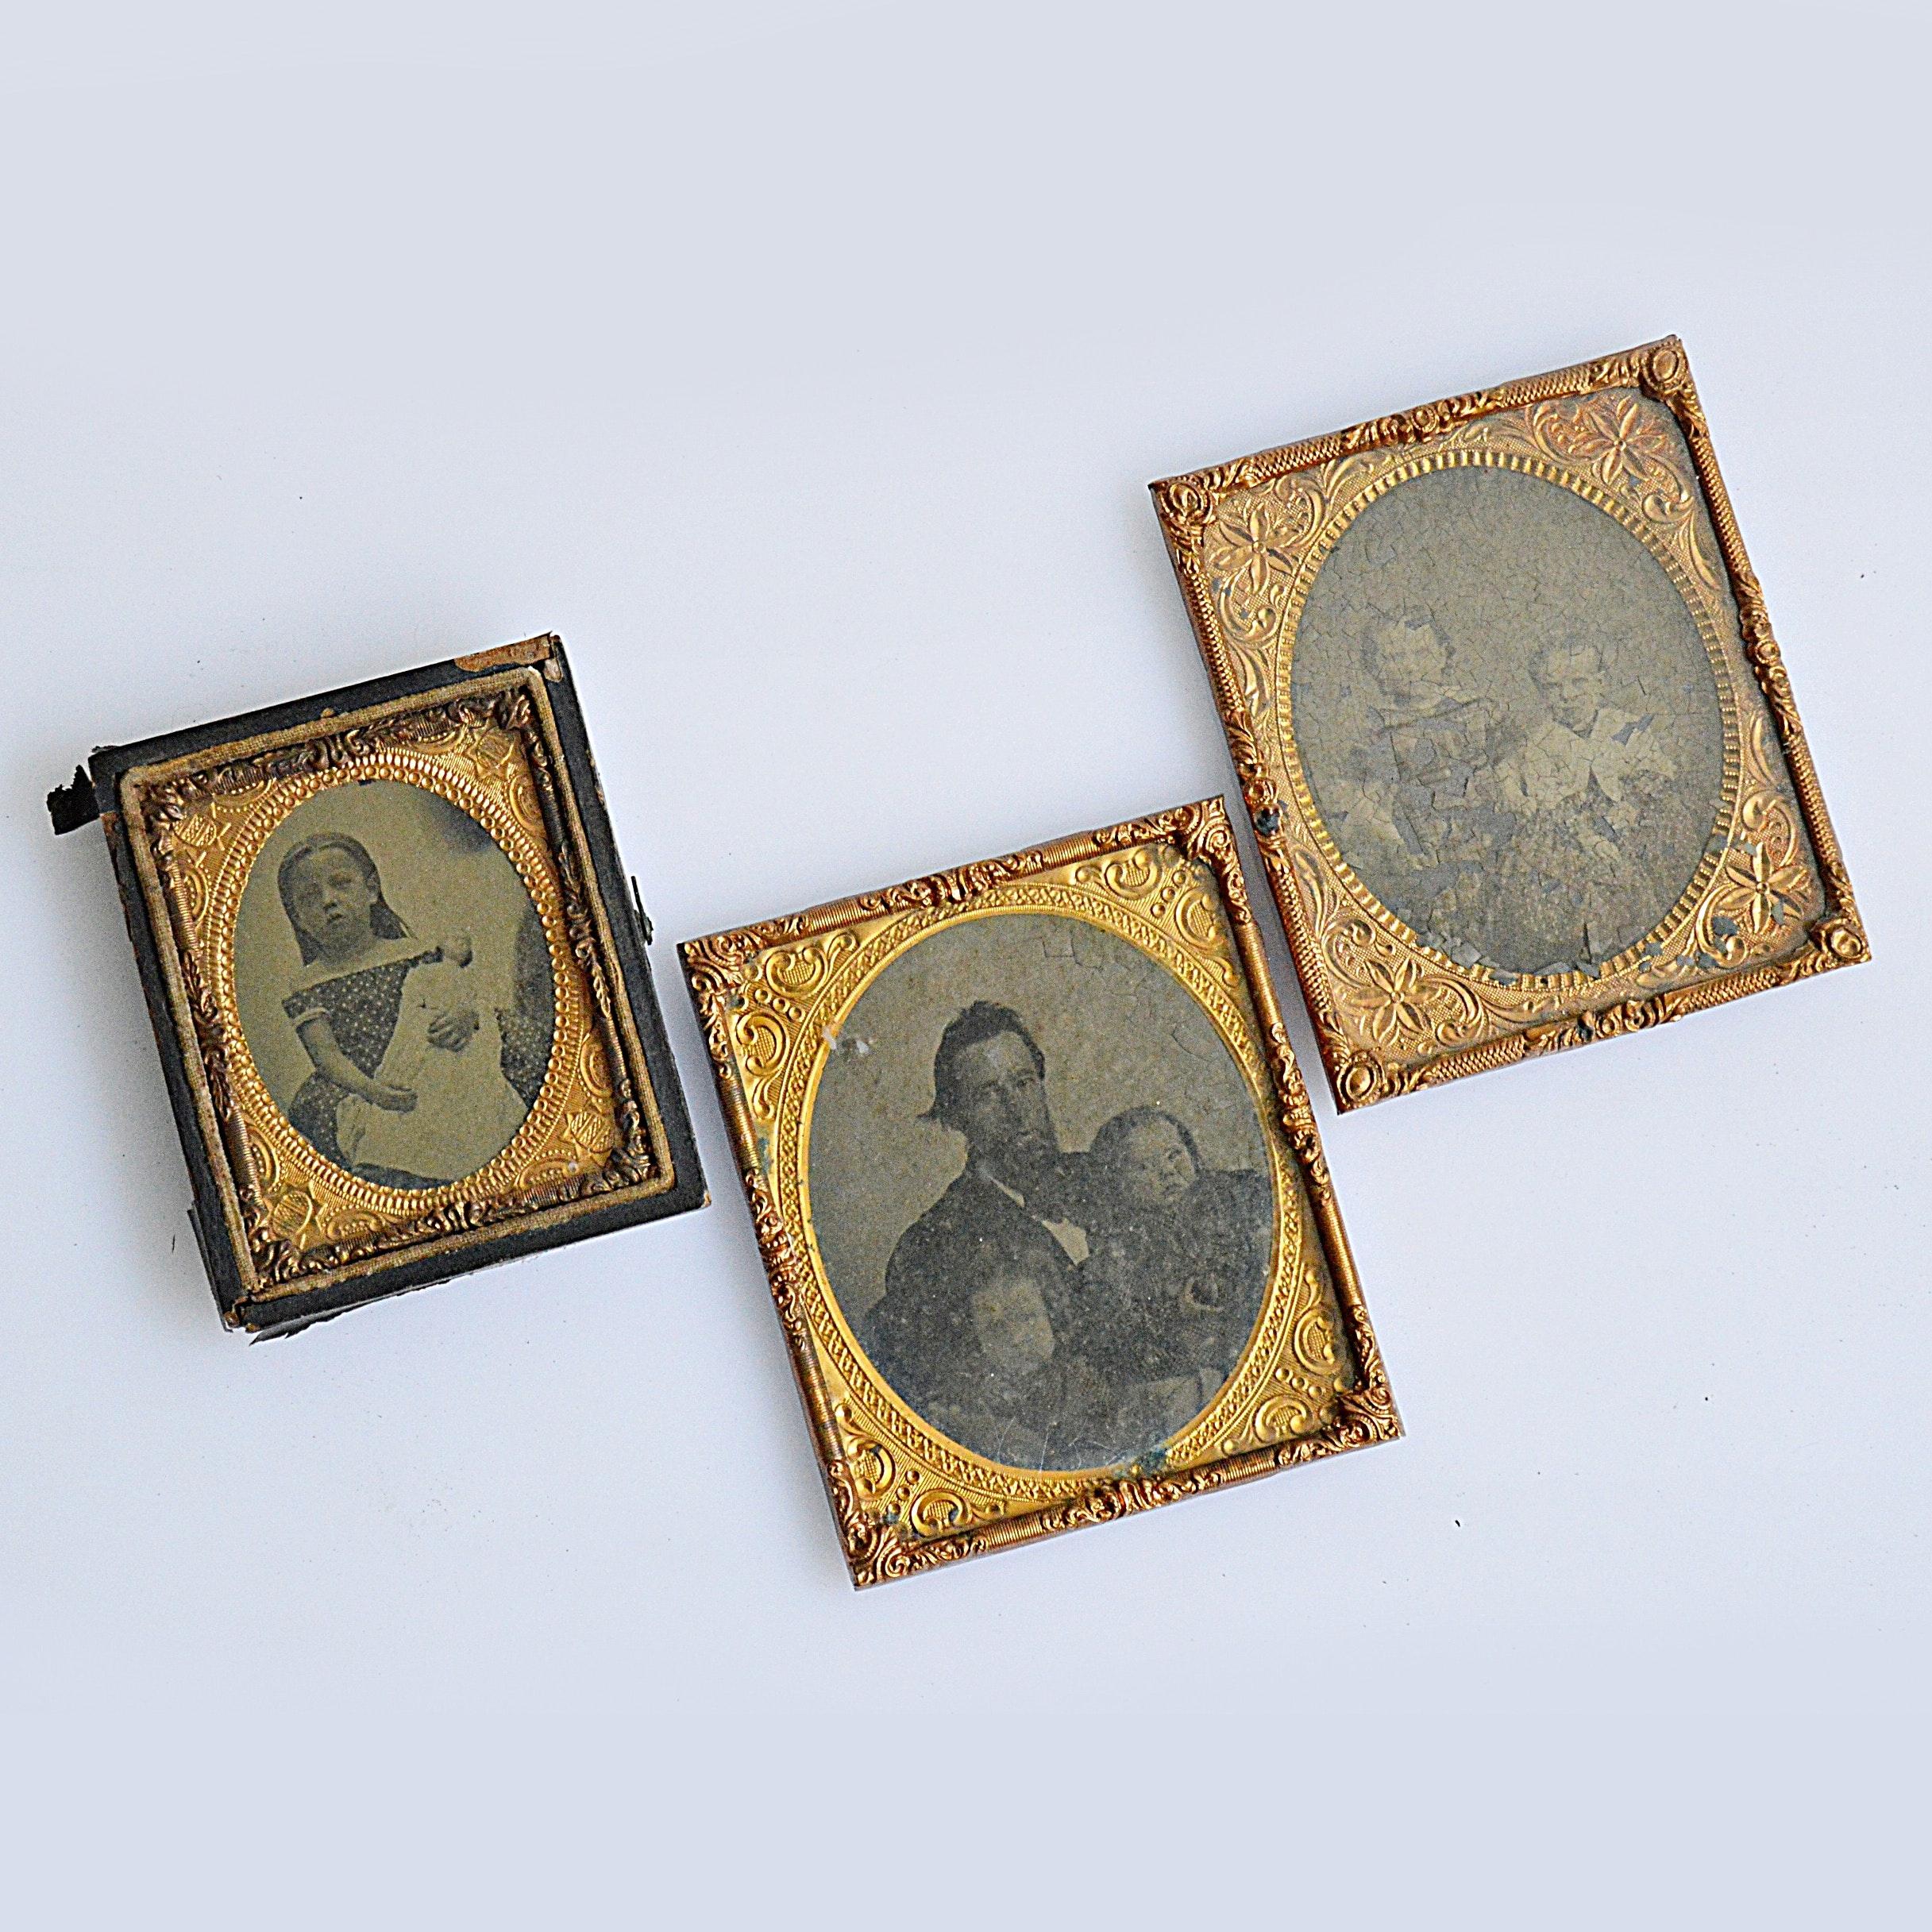 19th Century Tintype Photographs